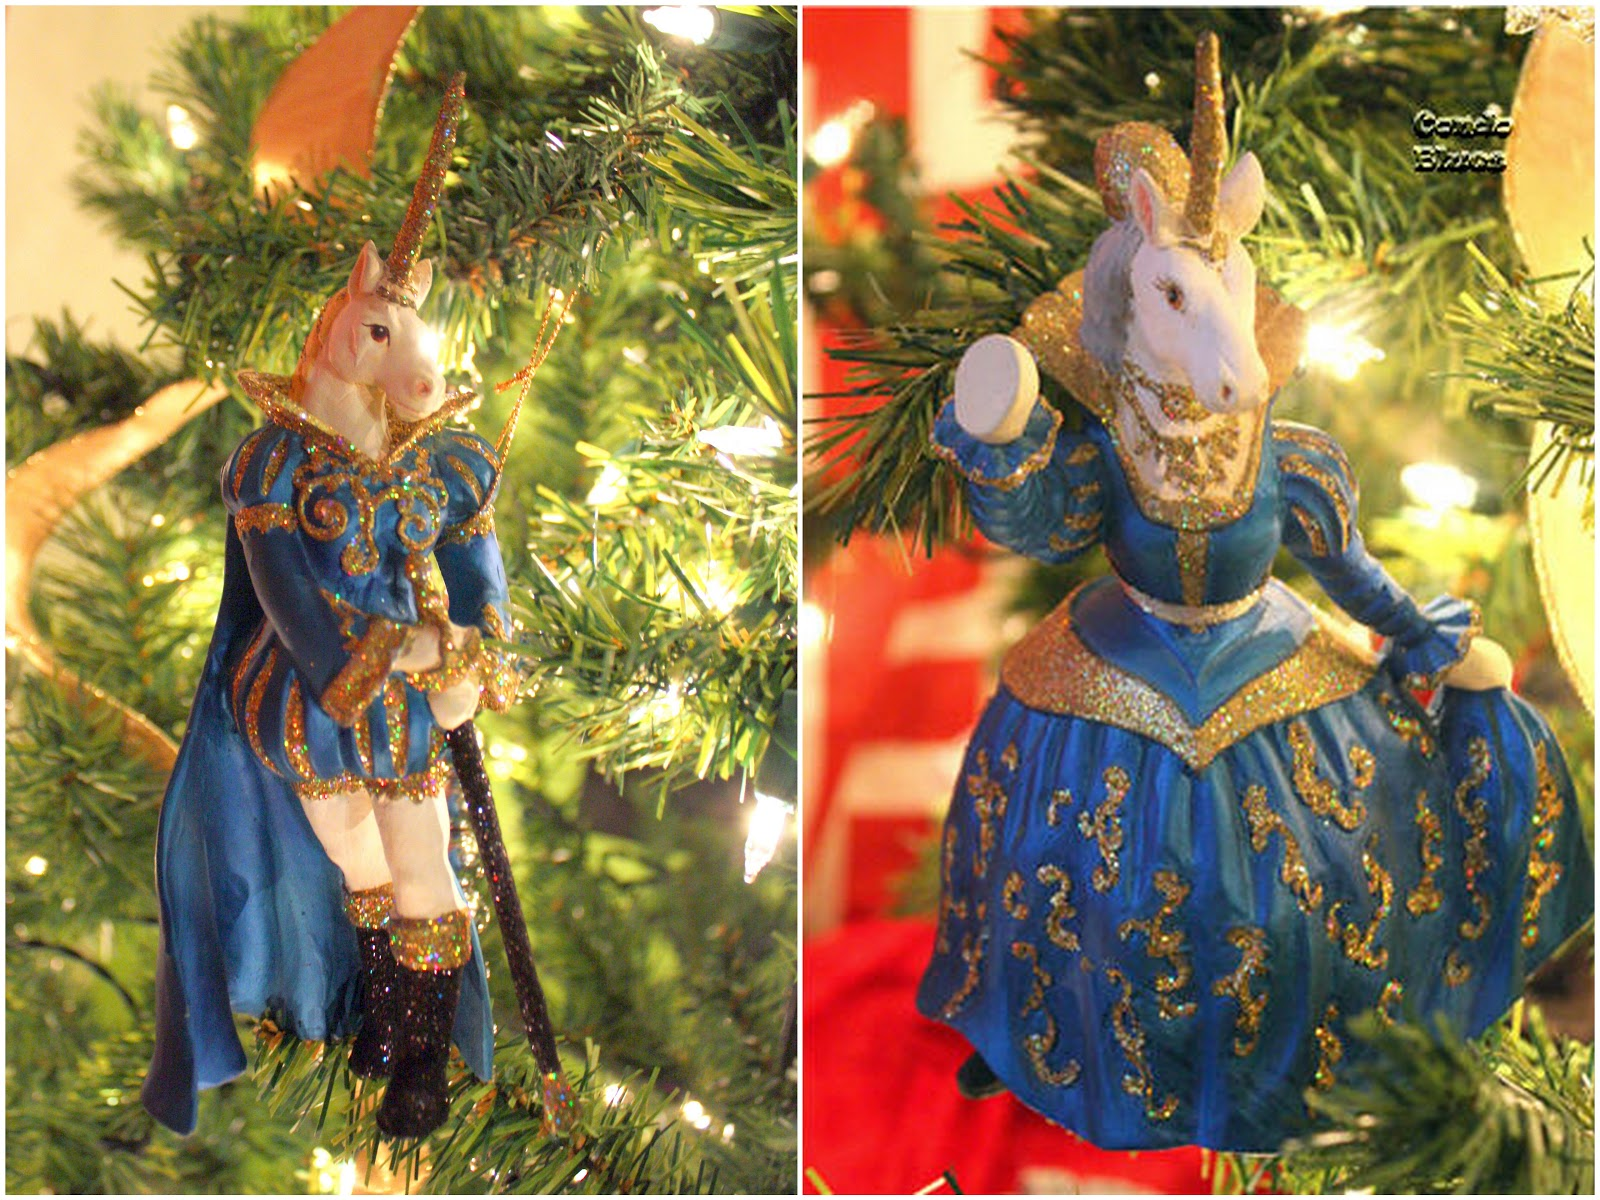 Condo Blues: Renaissance Christmas Tree